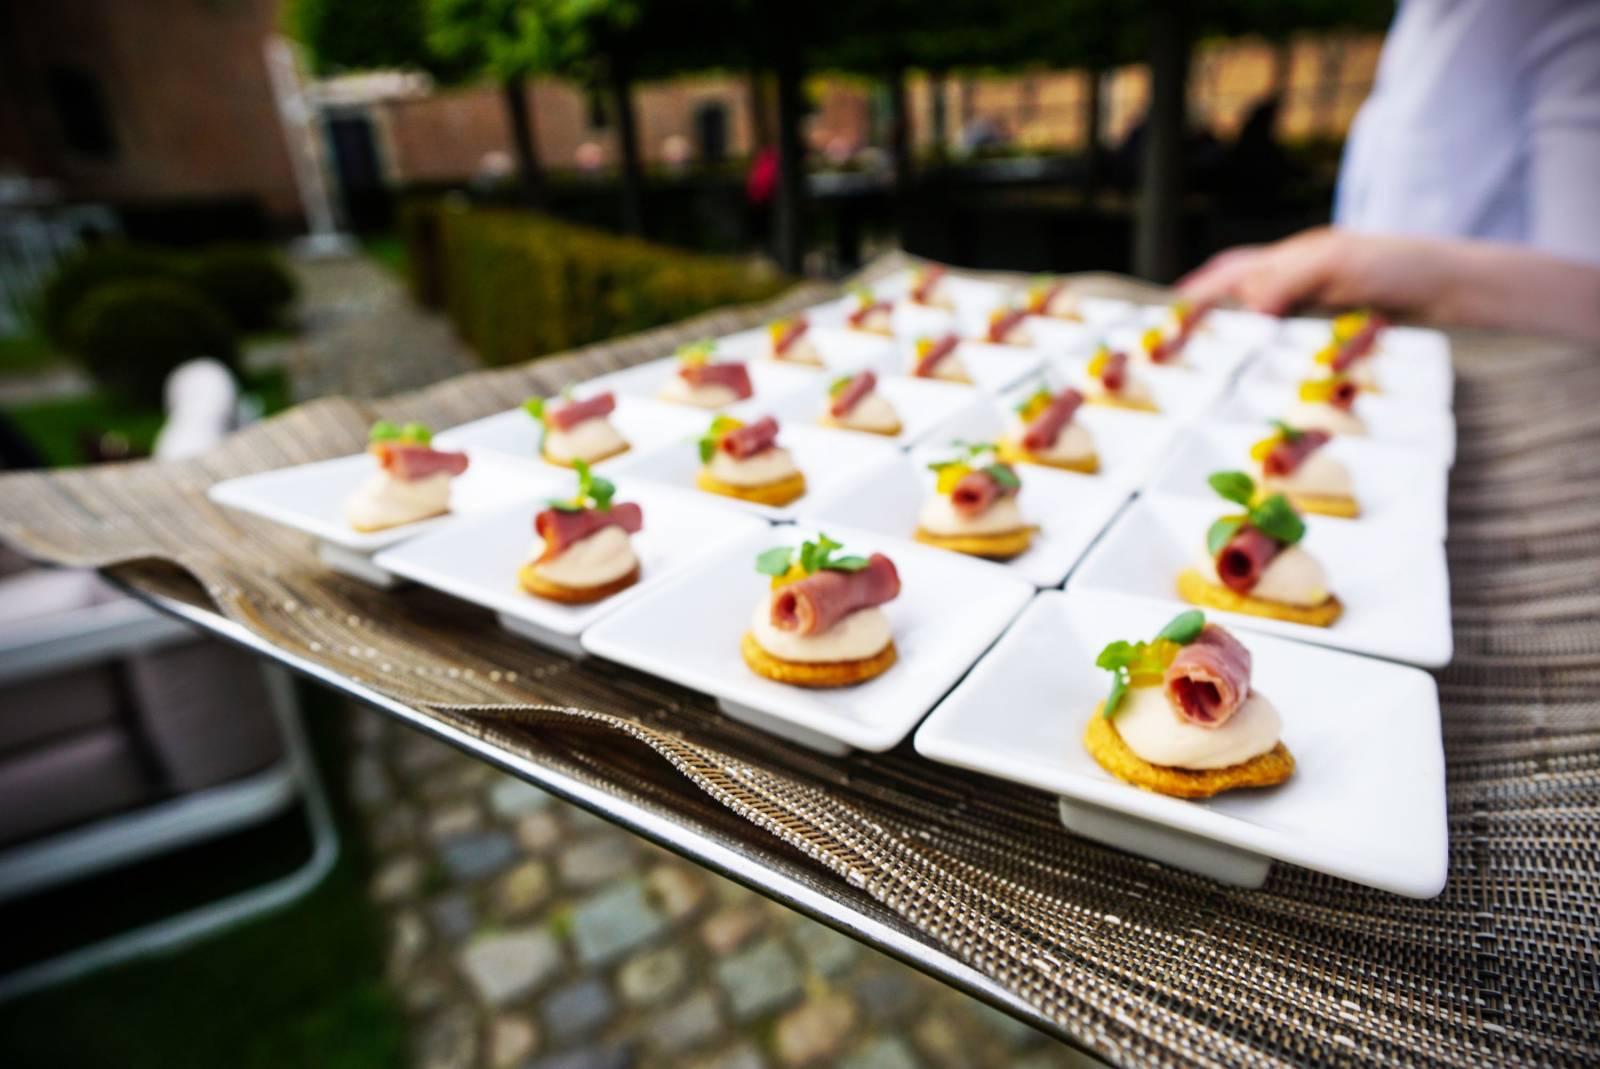 Faculty Club - Feestzaal te Leuven - Eventlocatie - GARDEN LOUNGE MEI 2019 - House of Events - 6